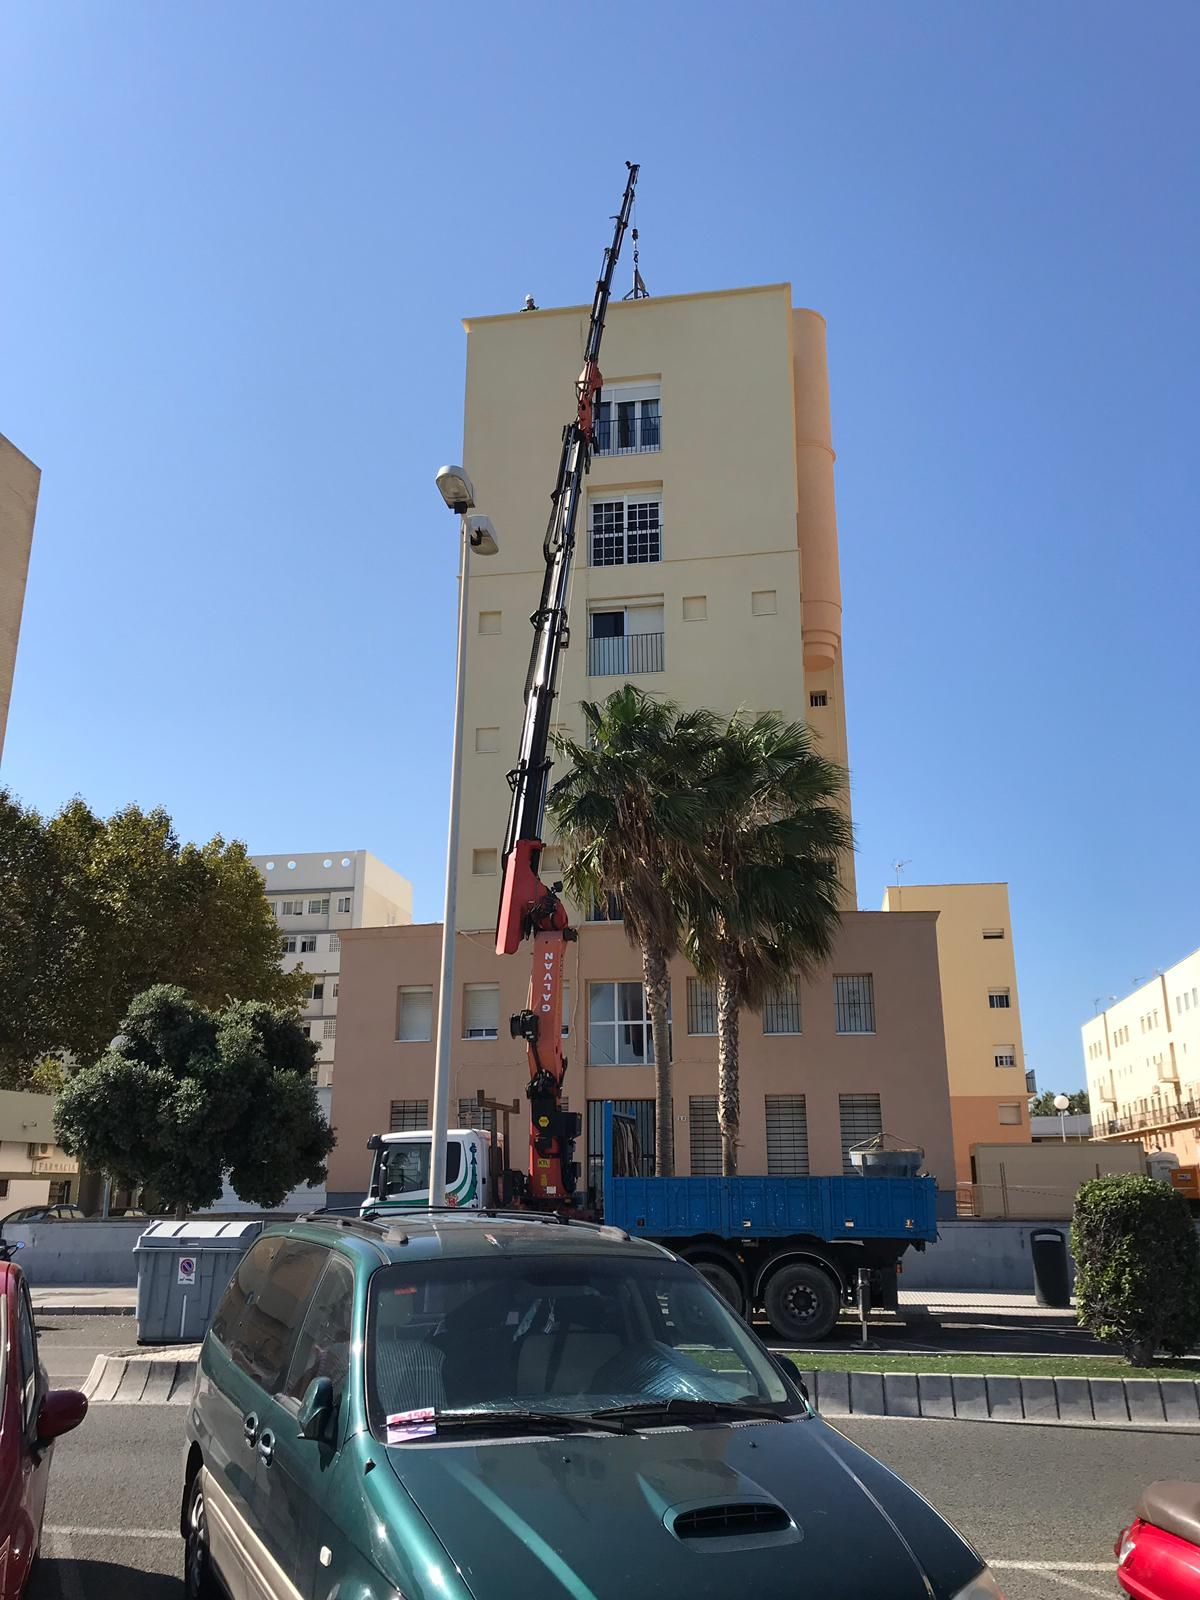 Alquiler de camiones grúa en Cádiz